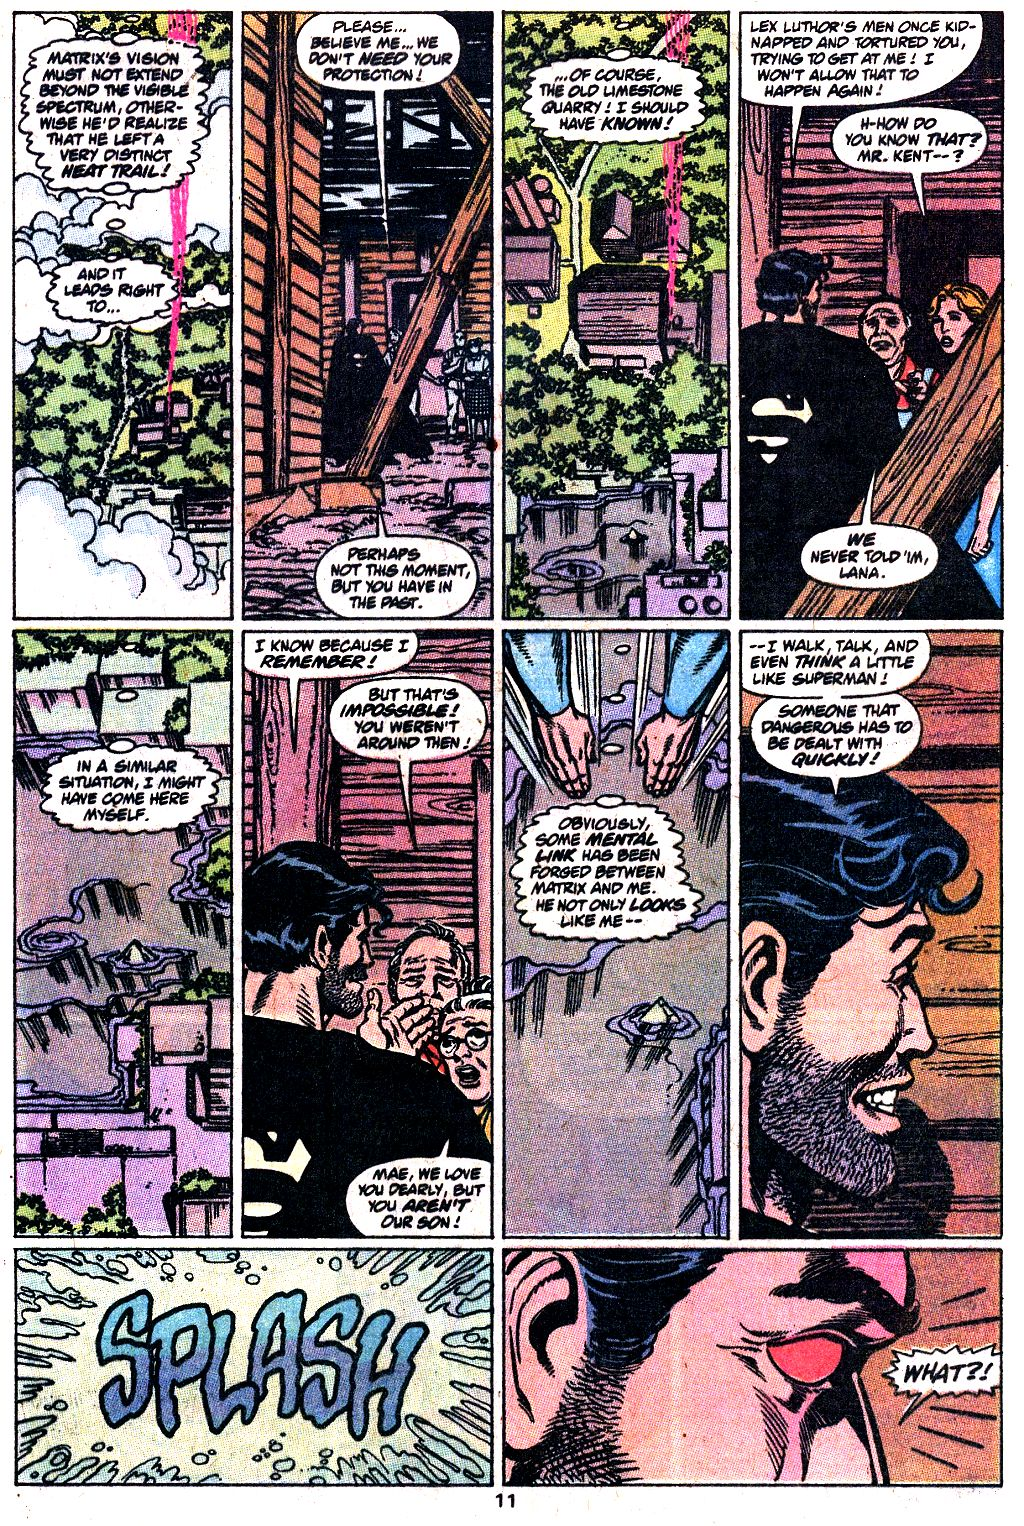 Action Comics (1938) 644 Page 11